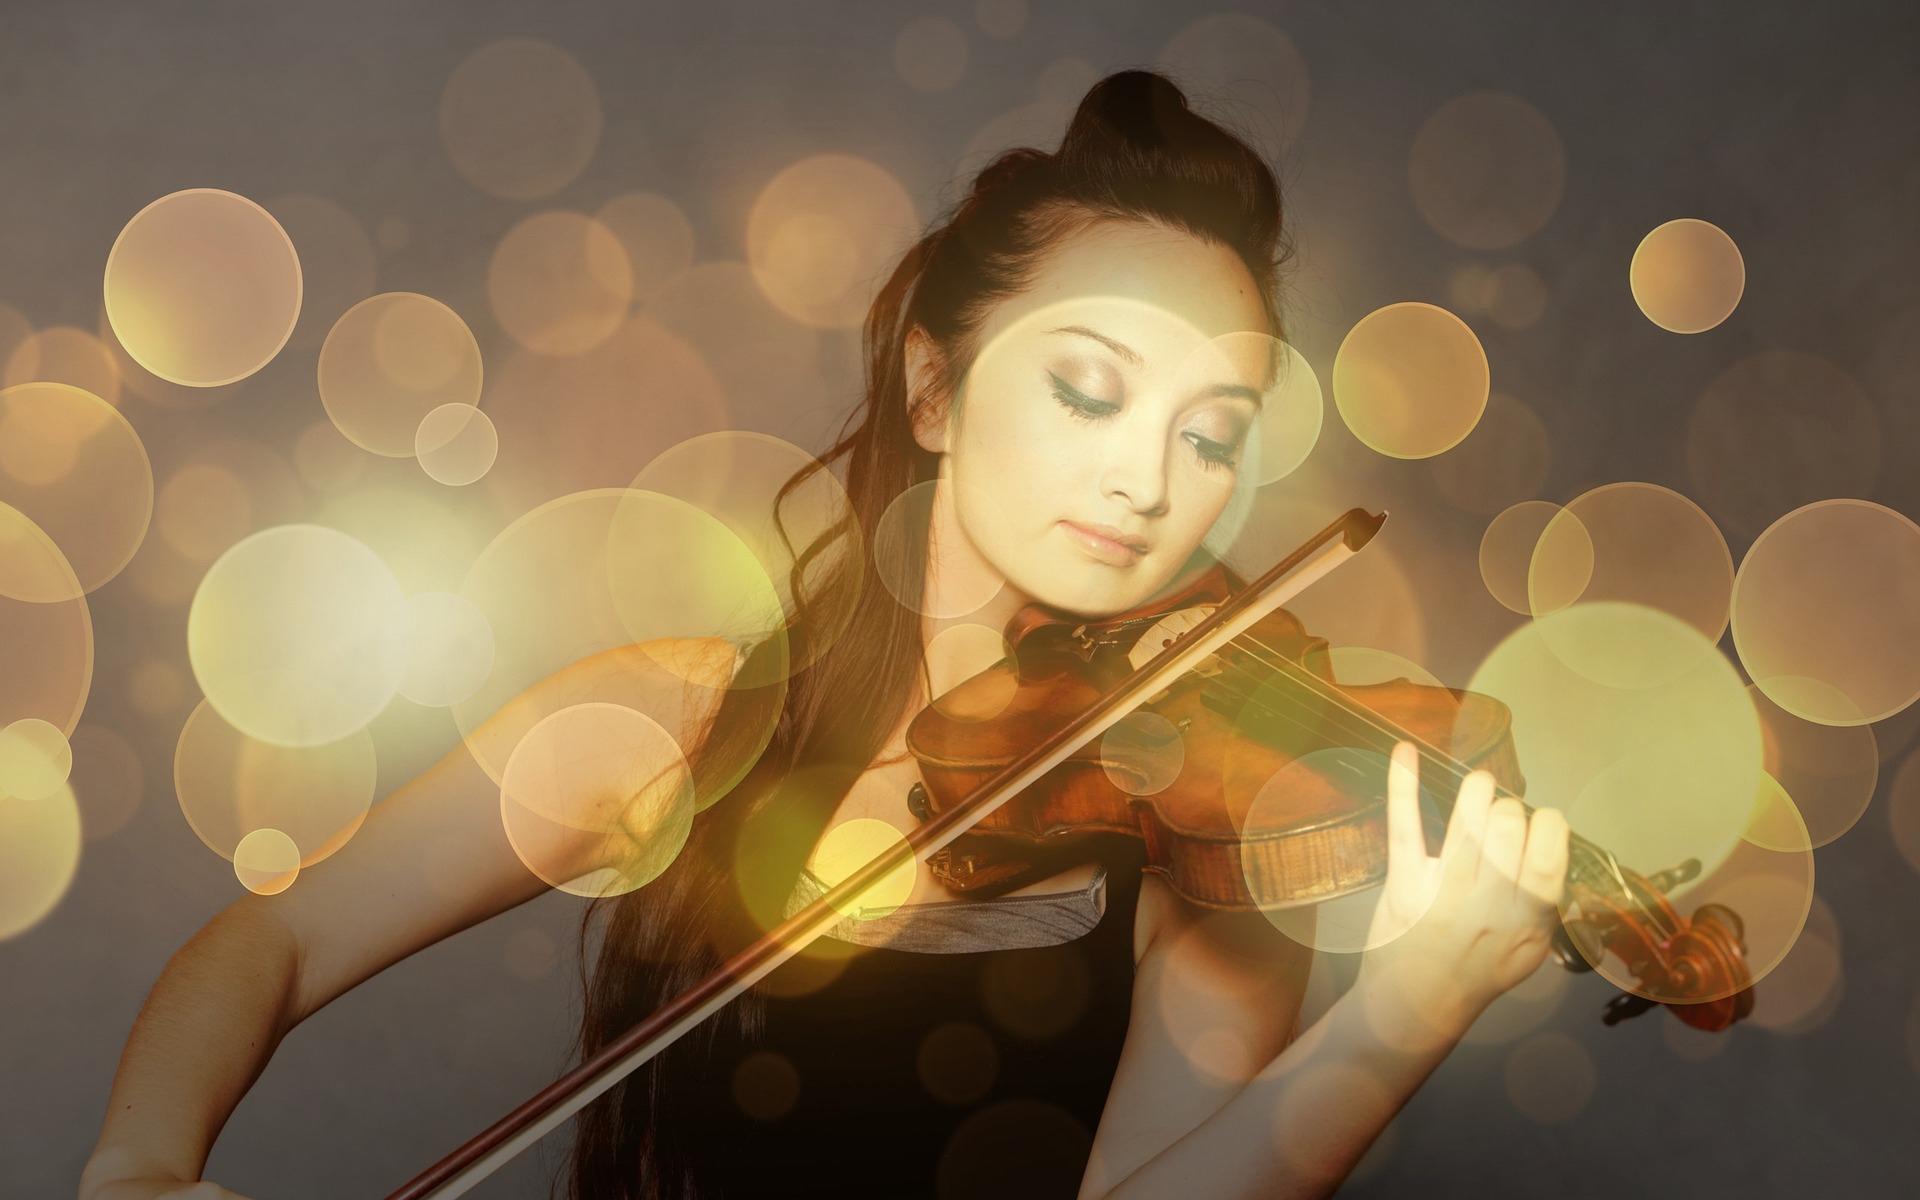 violin-1906127_1920_pixel2013